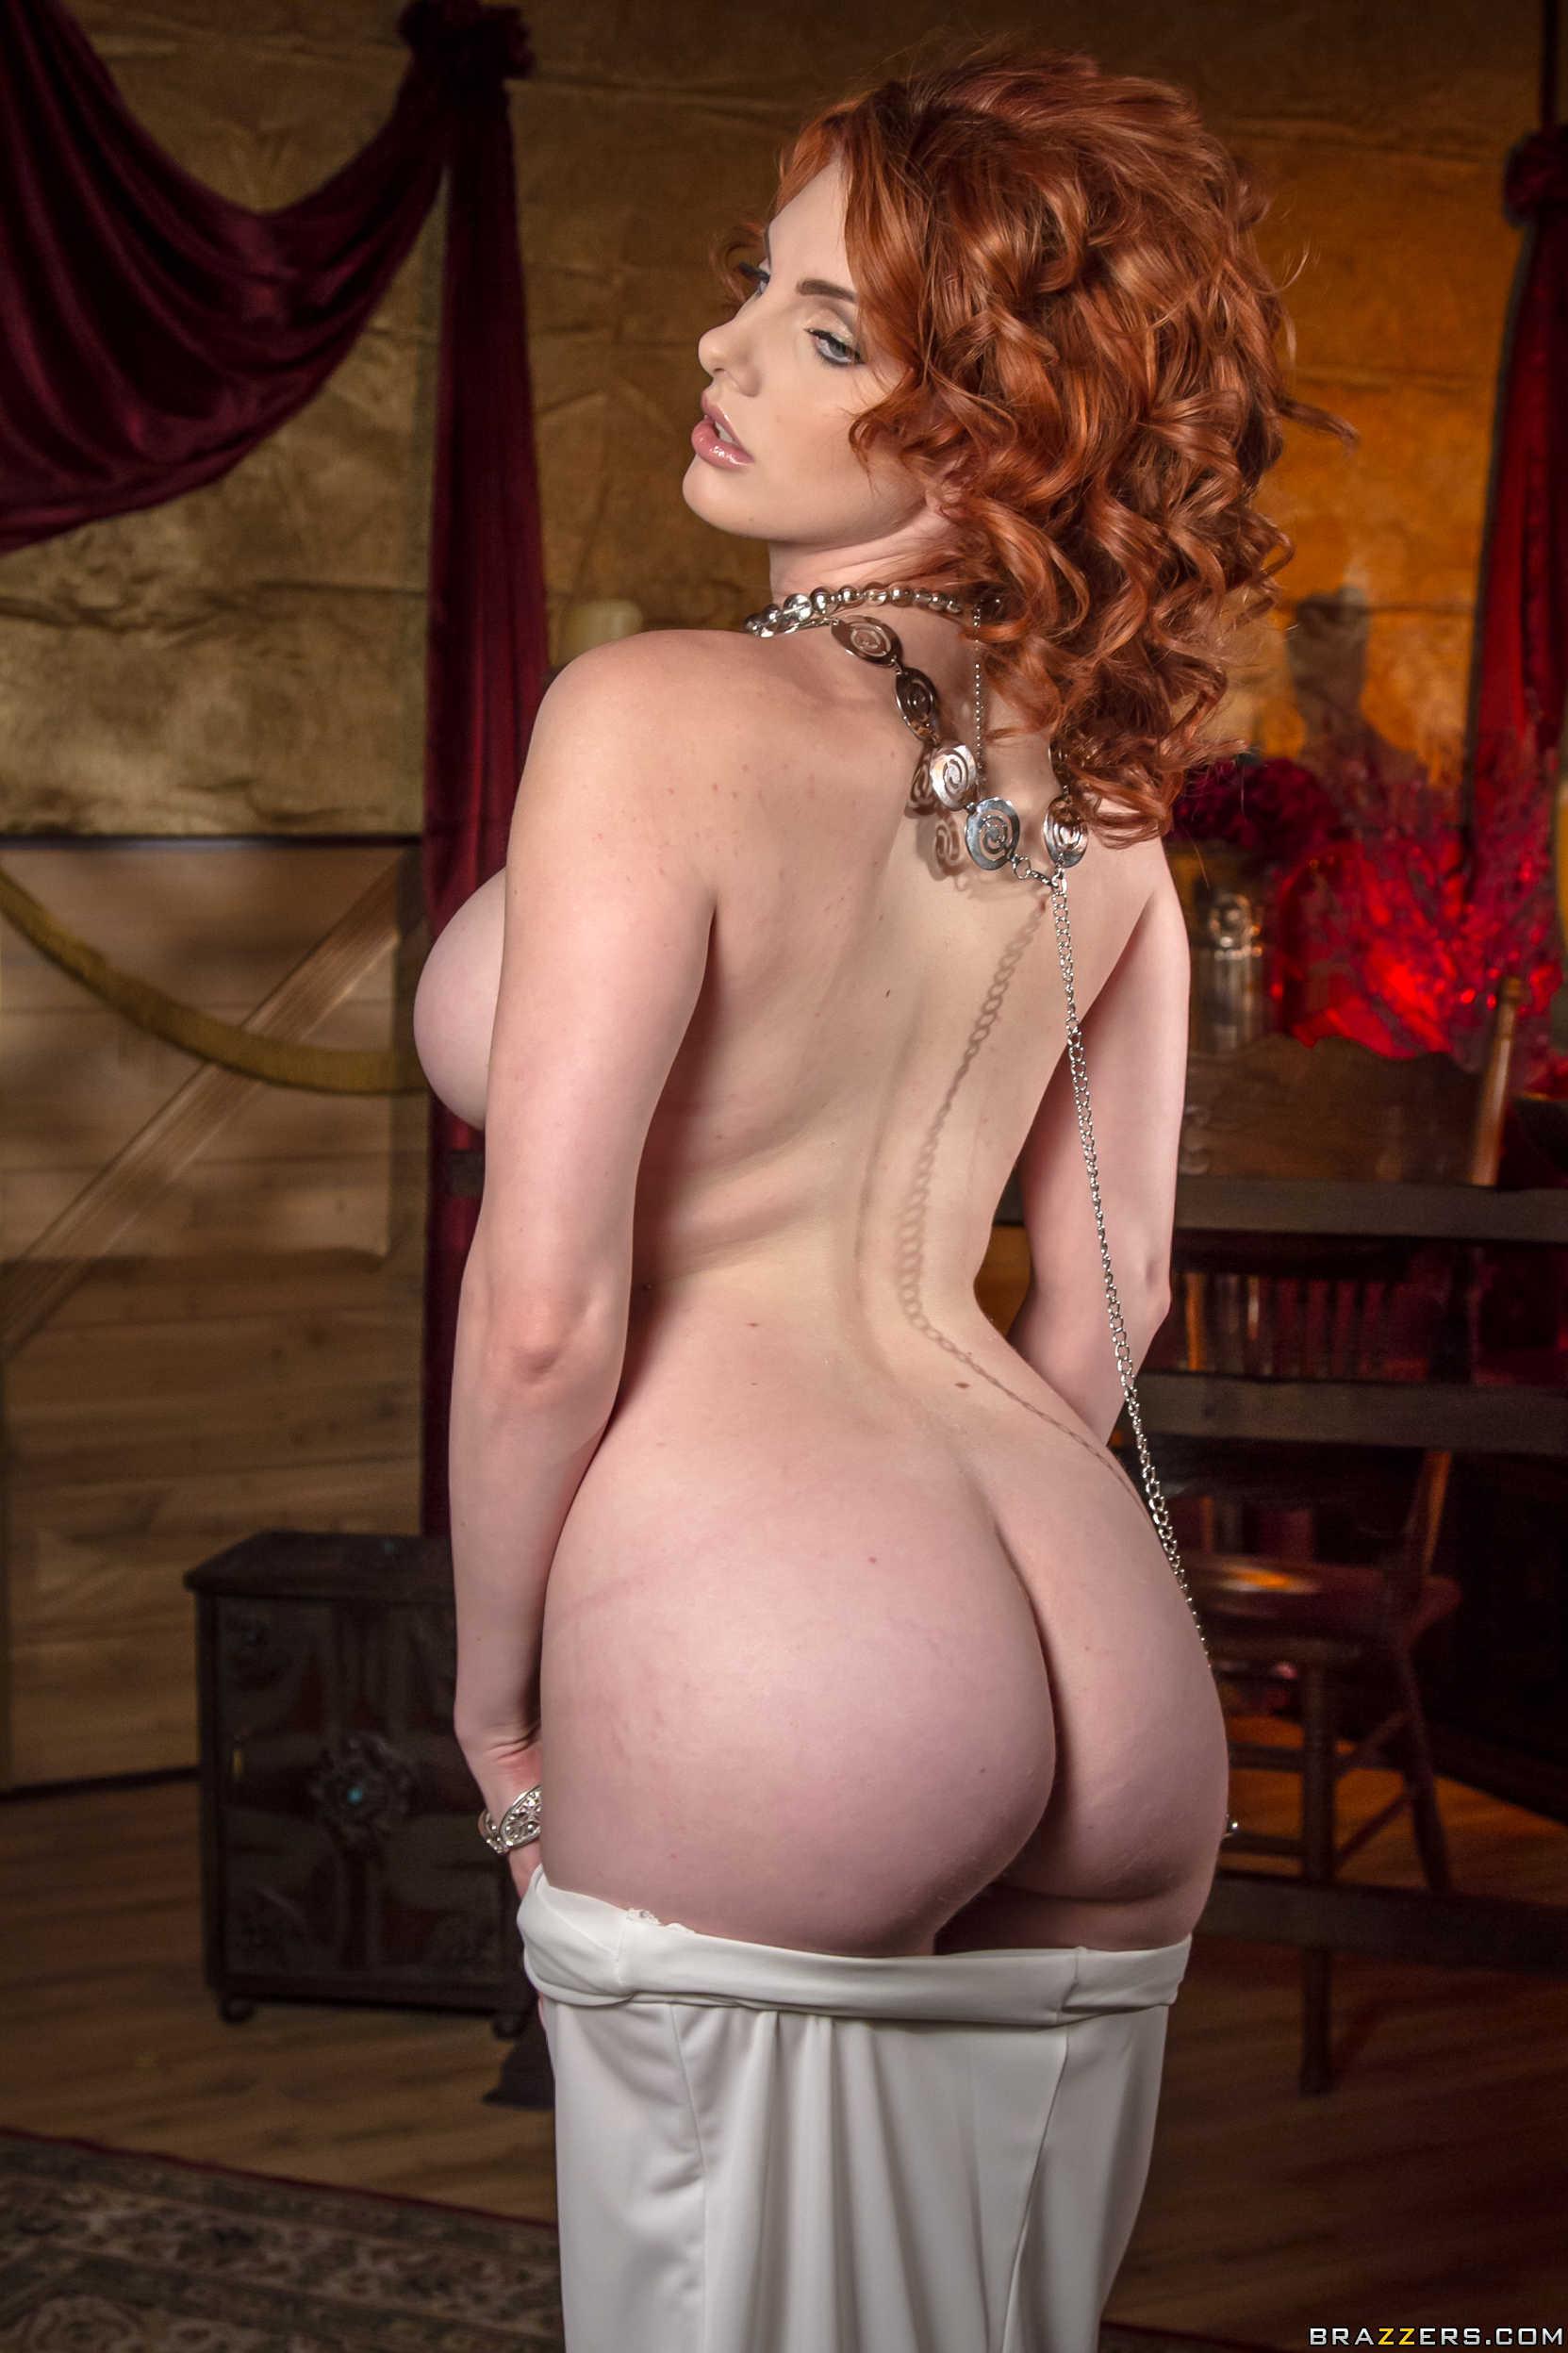 Hot blonde chastity enjoys taboo sex romp sex_photo8716